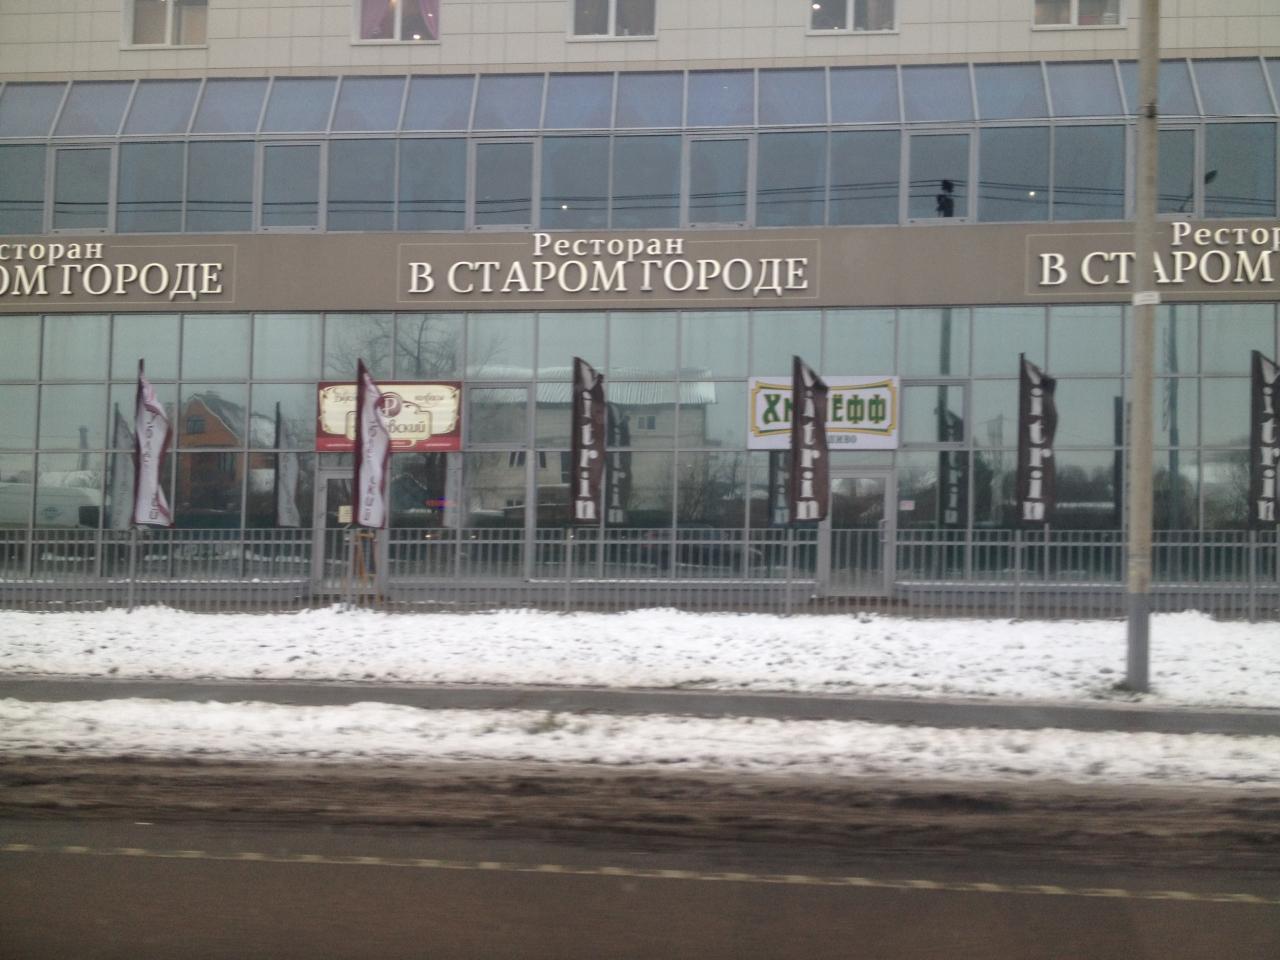 Ресторан старый город троицк [PUNIQRANDLINE-(au-dating-names.txt) 68